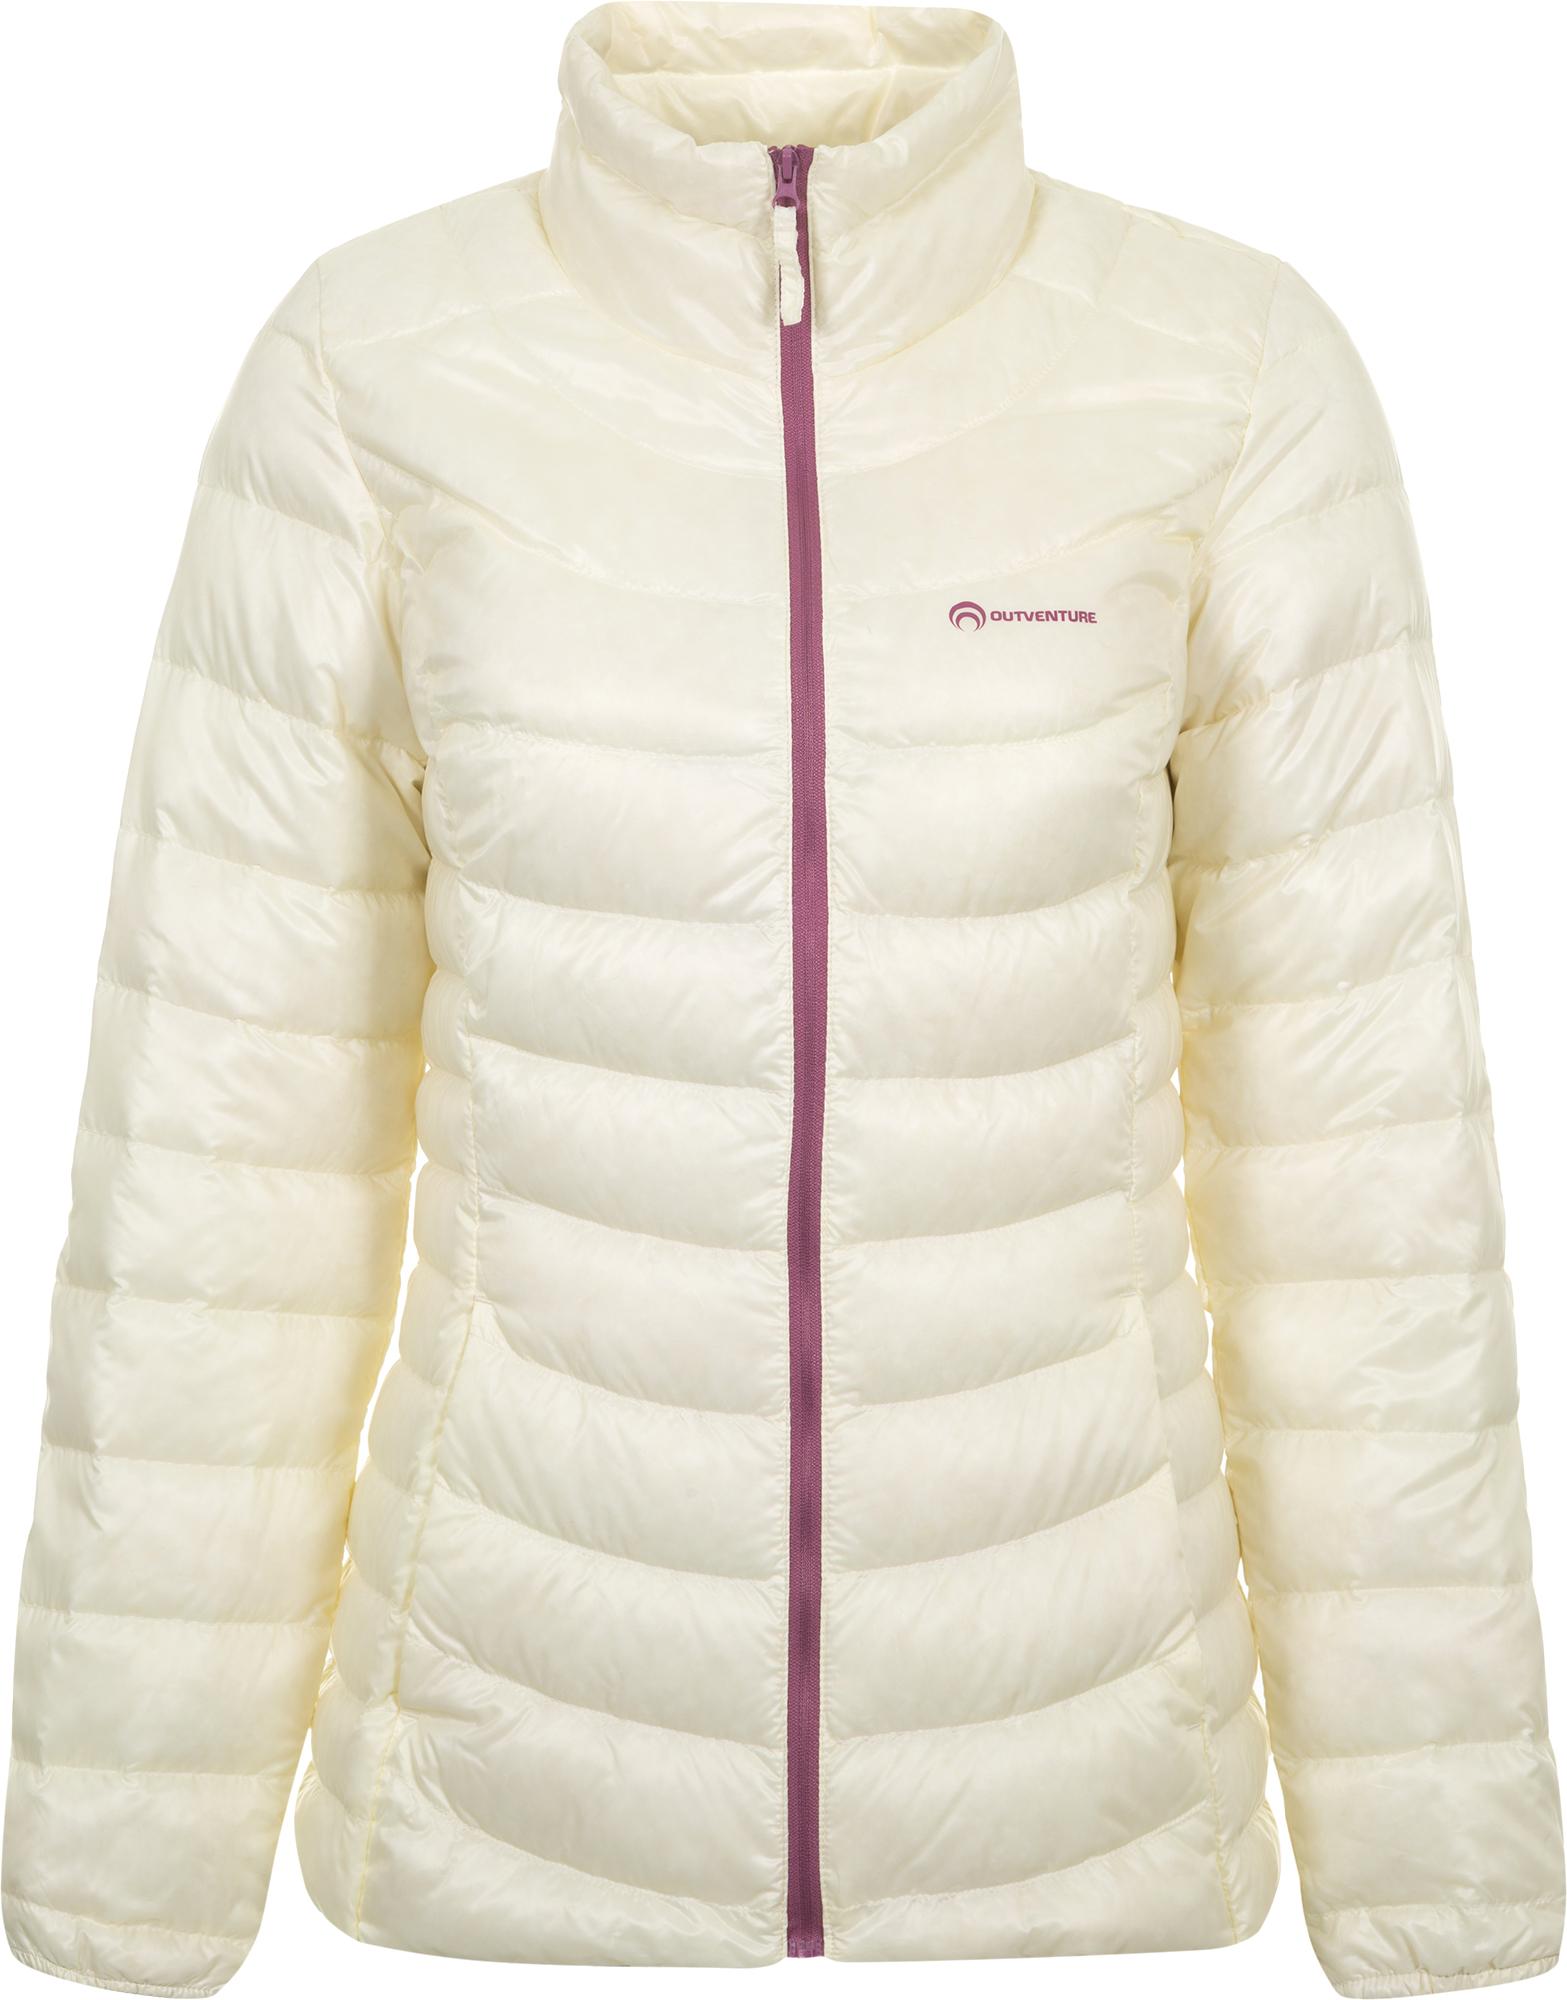 Outventure Куртка пуховая женская Outventure, размер 54